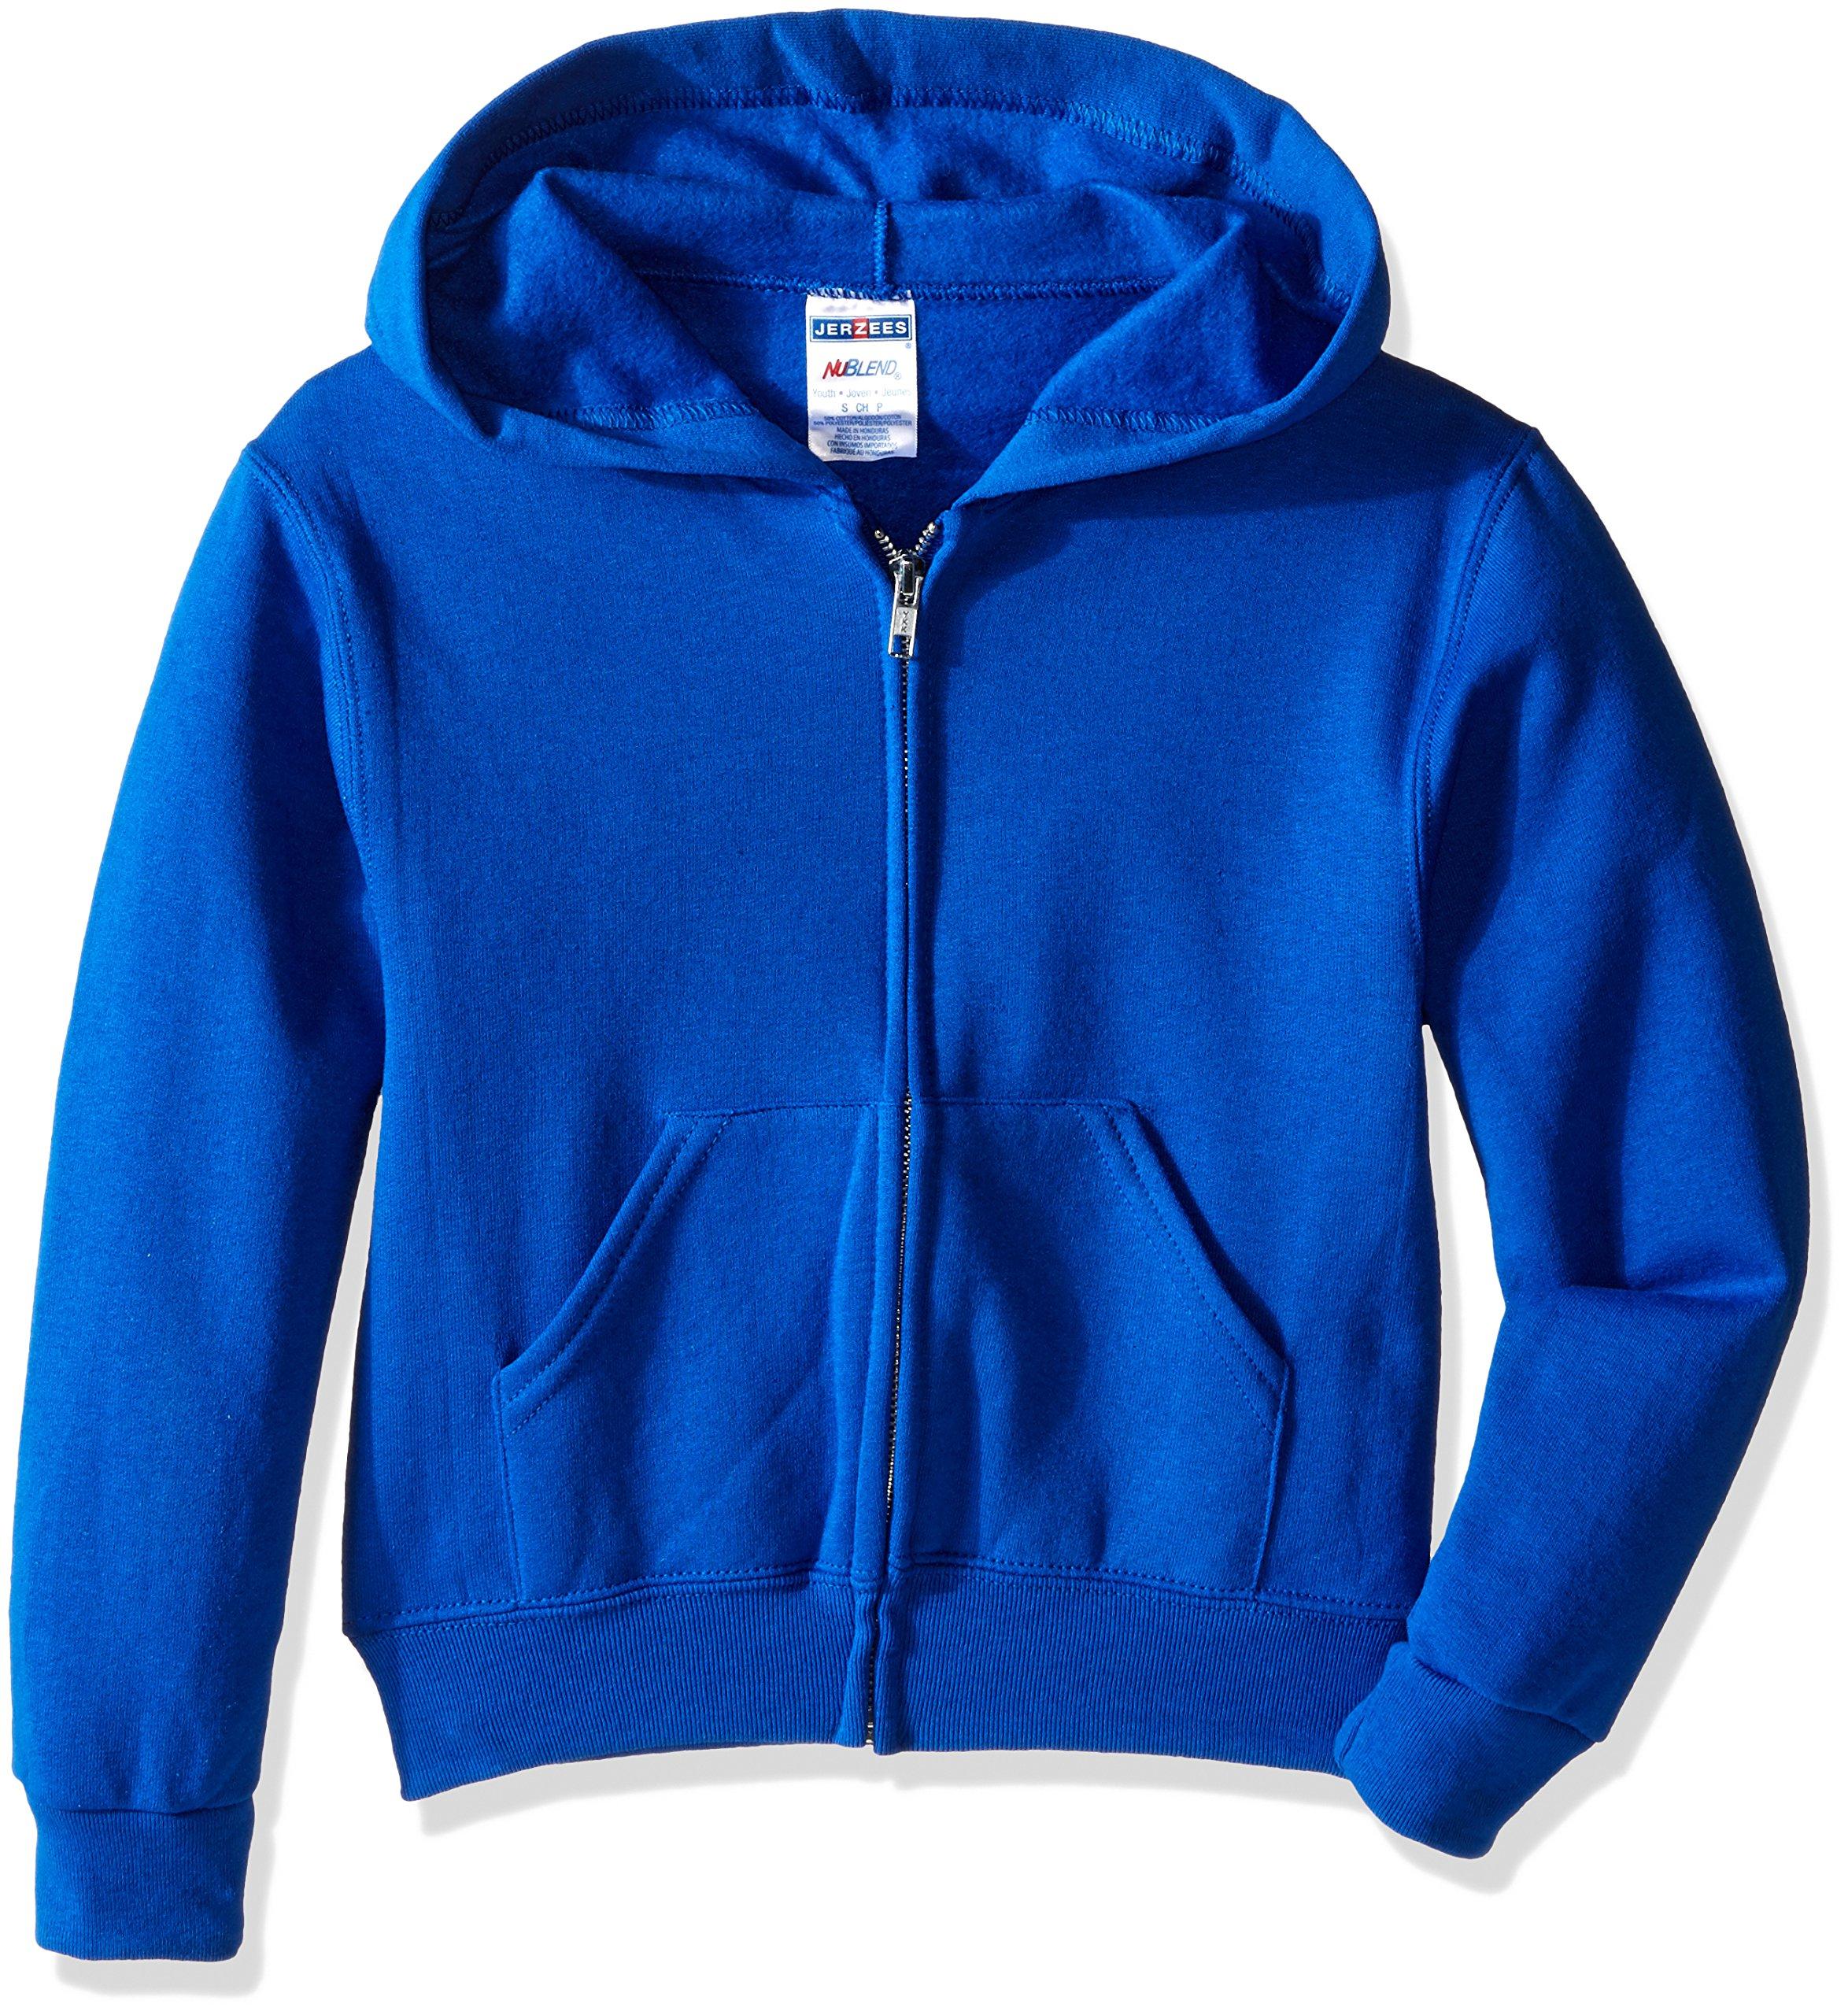 Jerzees Youth Full Zip Hooded Sweatshirt, Royal, Large